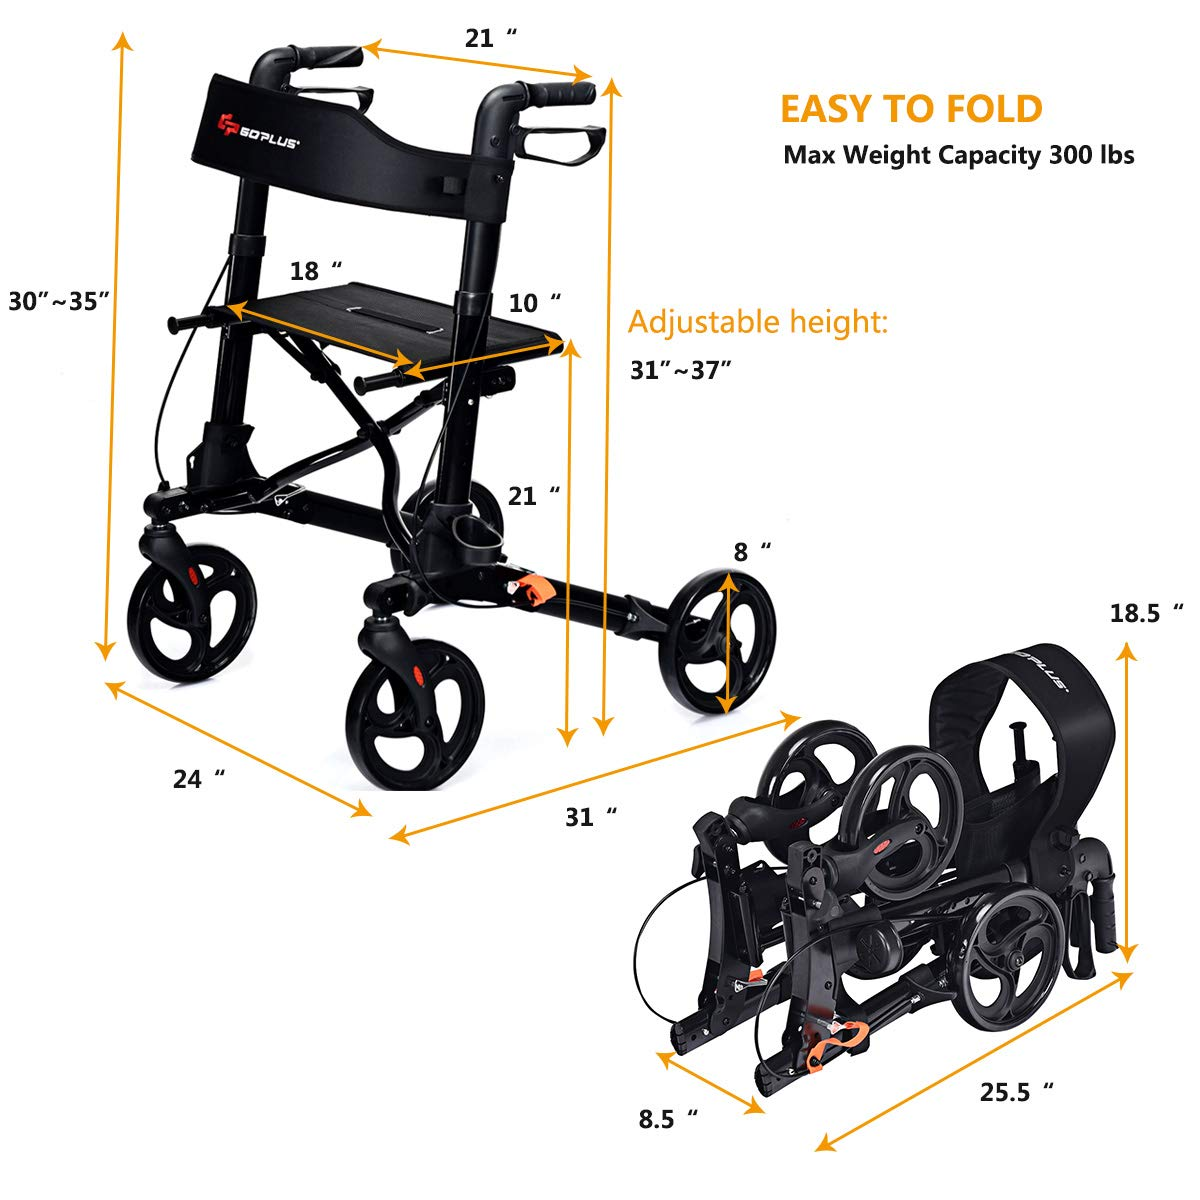 Amazon.com: Goplus - Andador plegable con ruedas, con ...